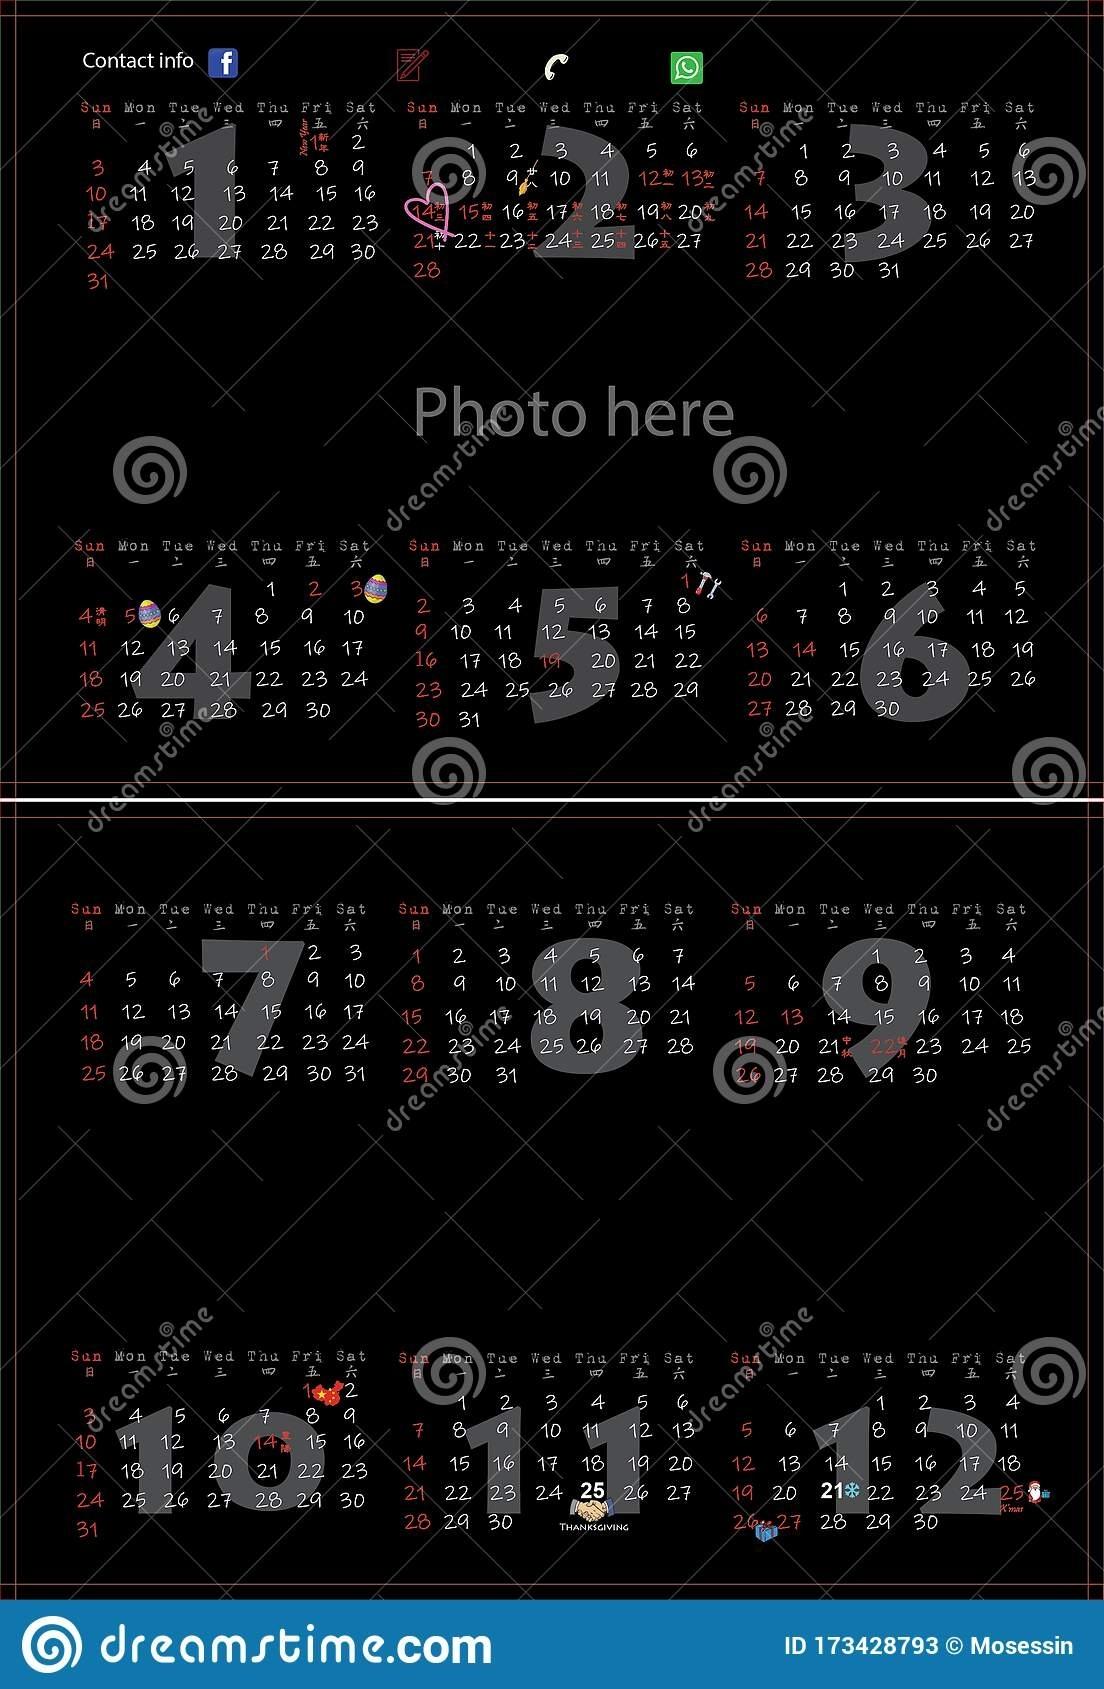 2021 Hk Calendar Template Stock Vector. Illustration Of Hong Kong Calendar 2021 Template